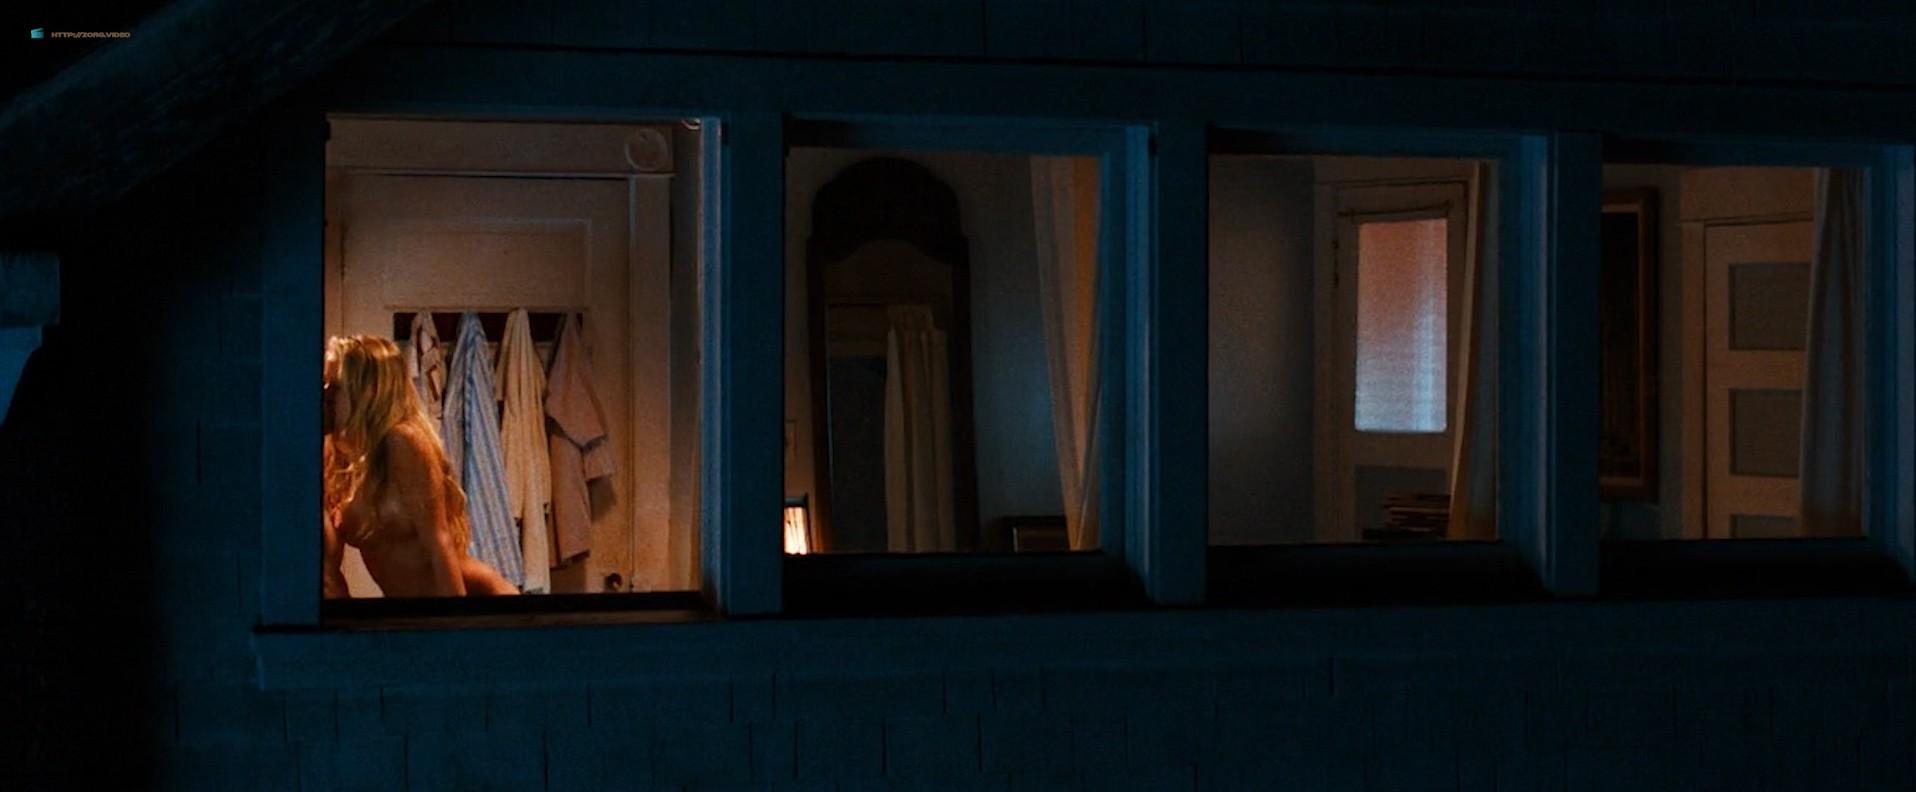 Jennifer Lopez hot sex scene and Lexi Atkins nude sex - The Boy Next Door (2015) HD 1080p (4)